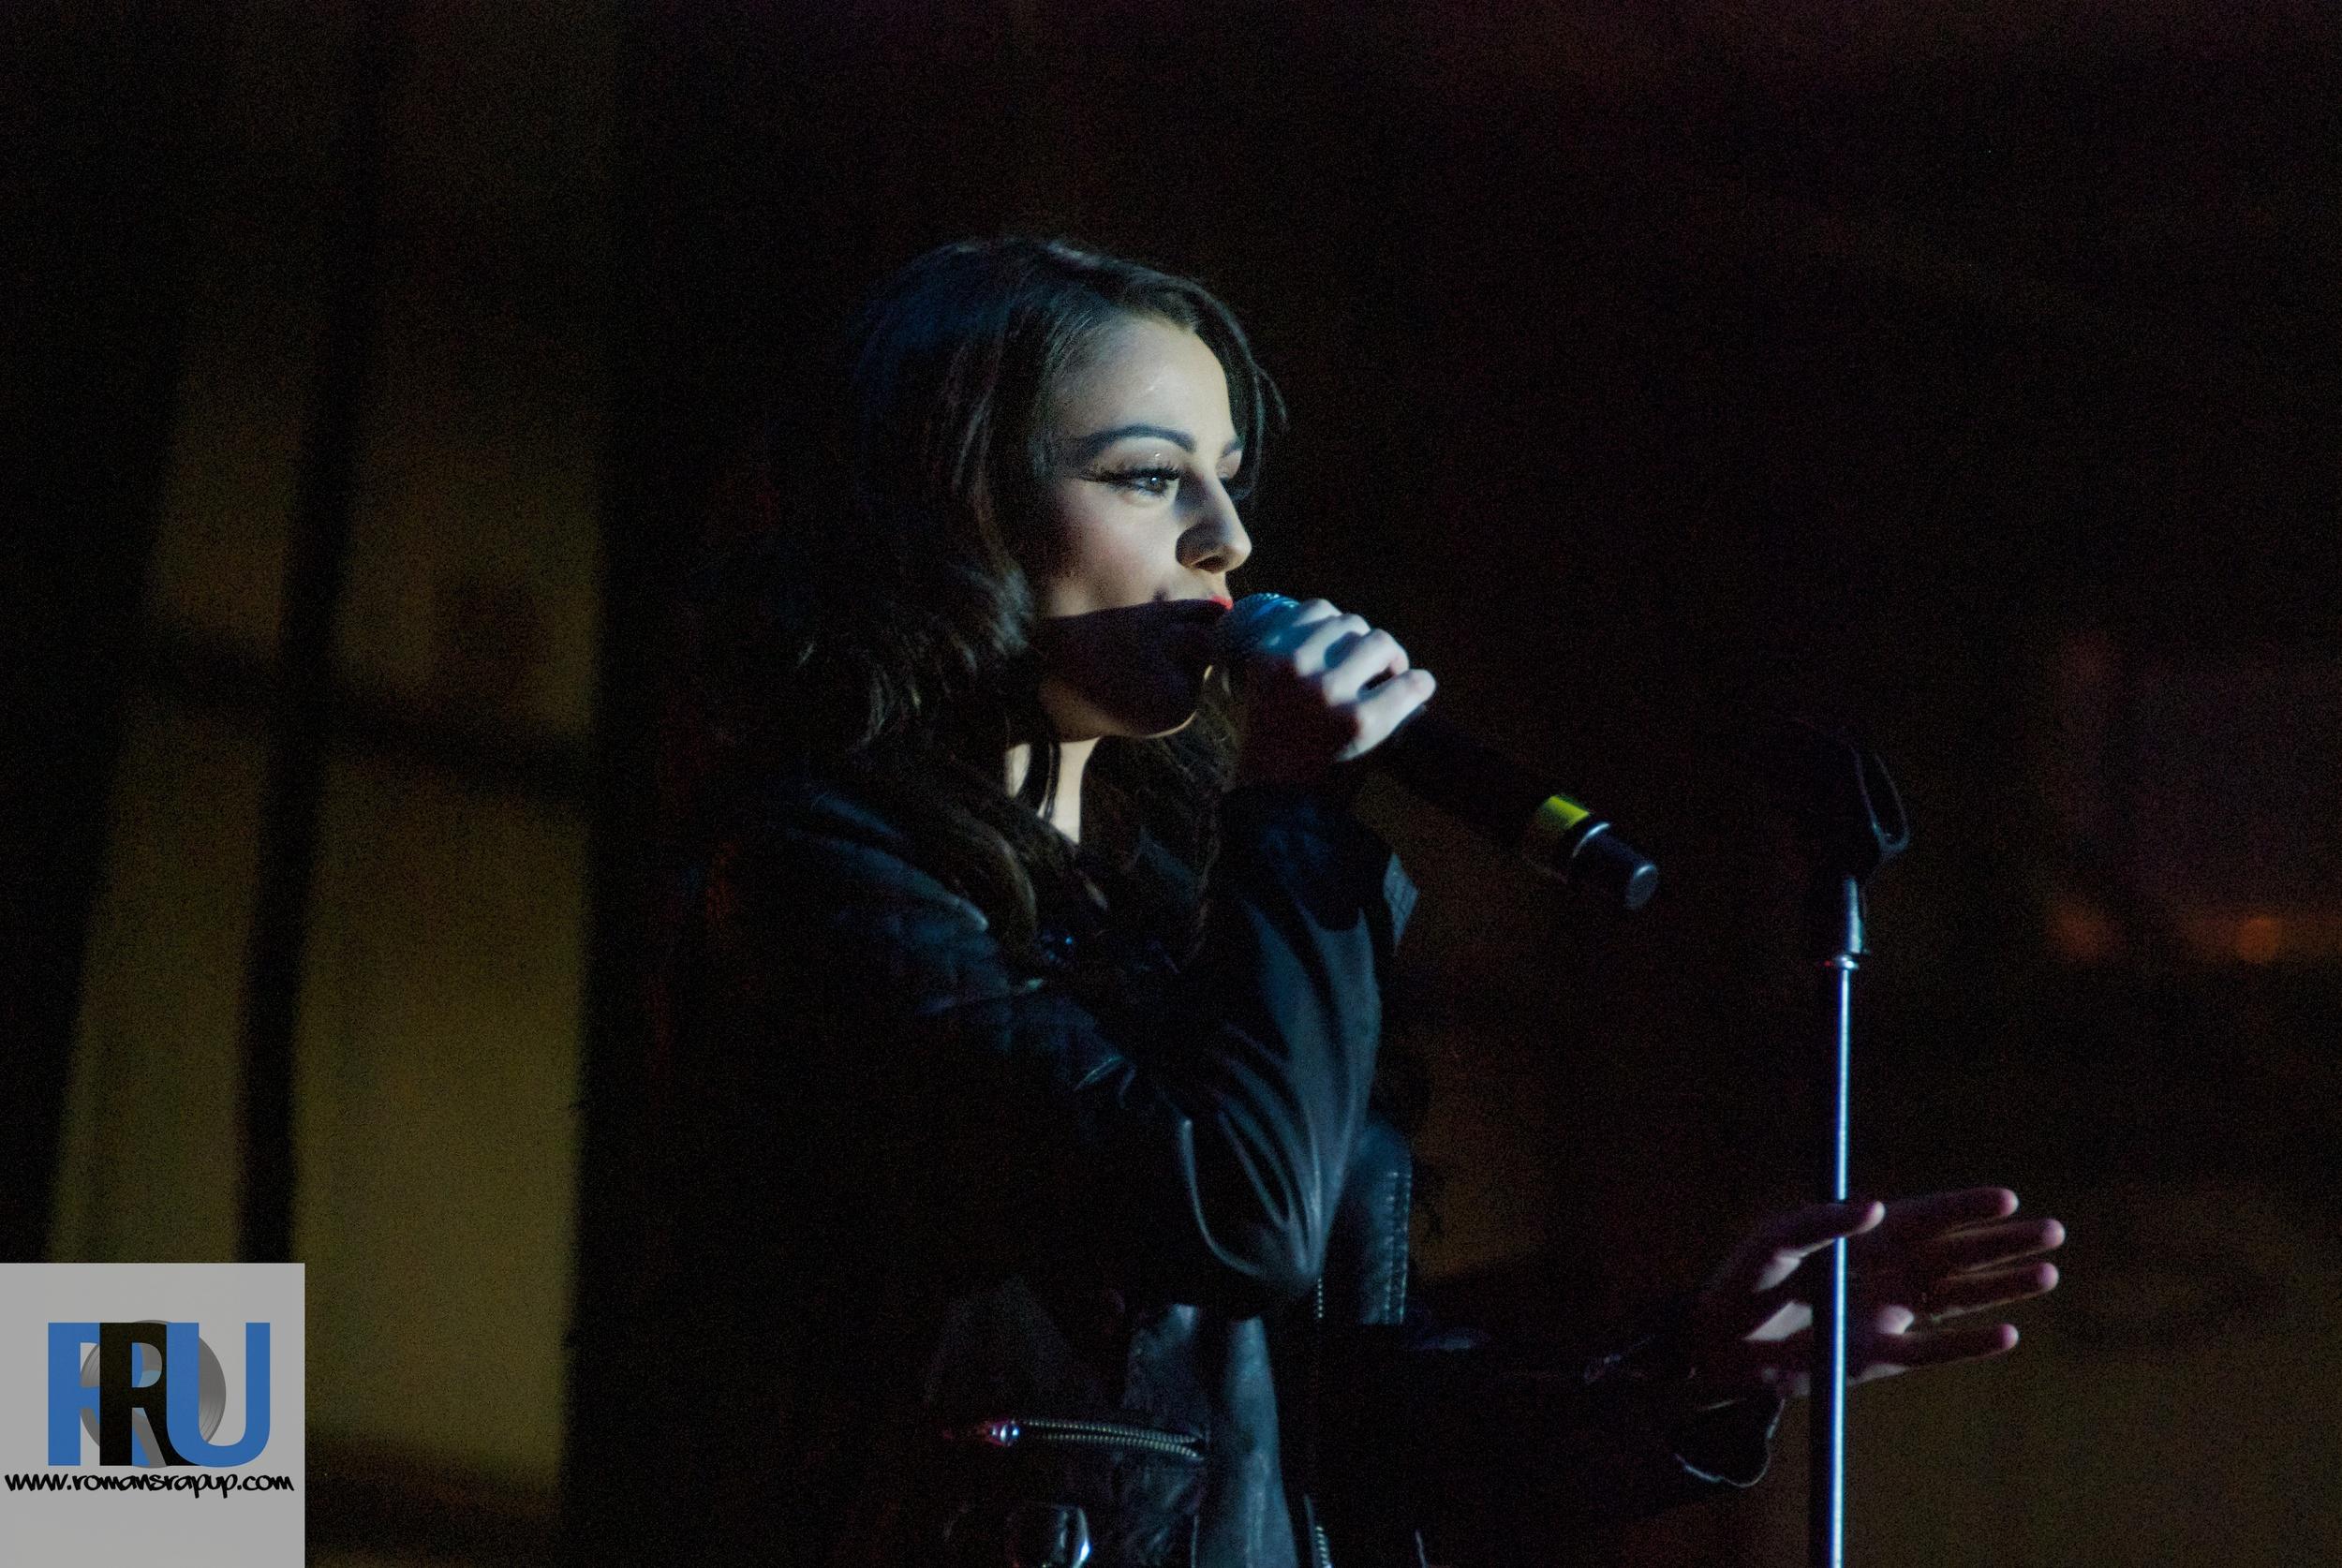 Cher Lloyd Topsfield Fair 10-12-13 44.jpg